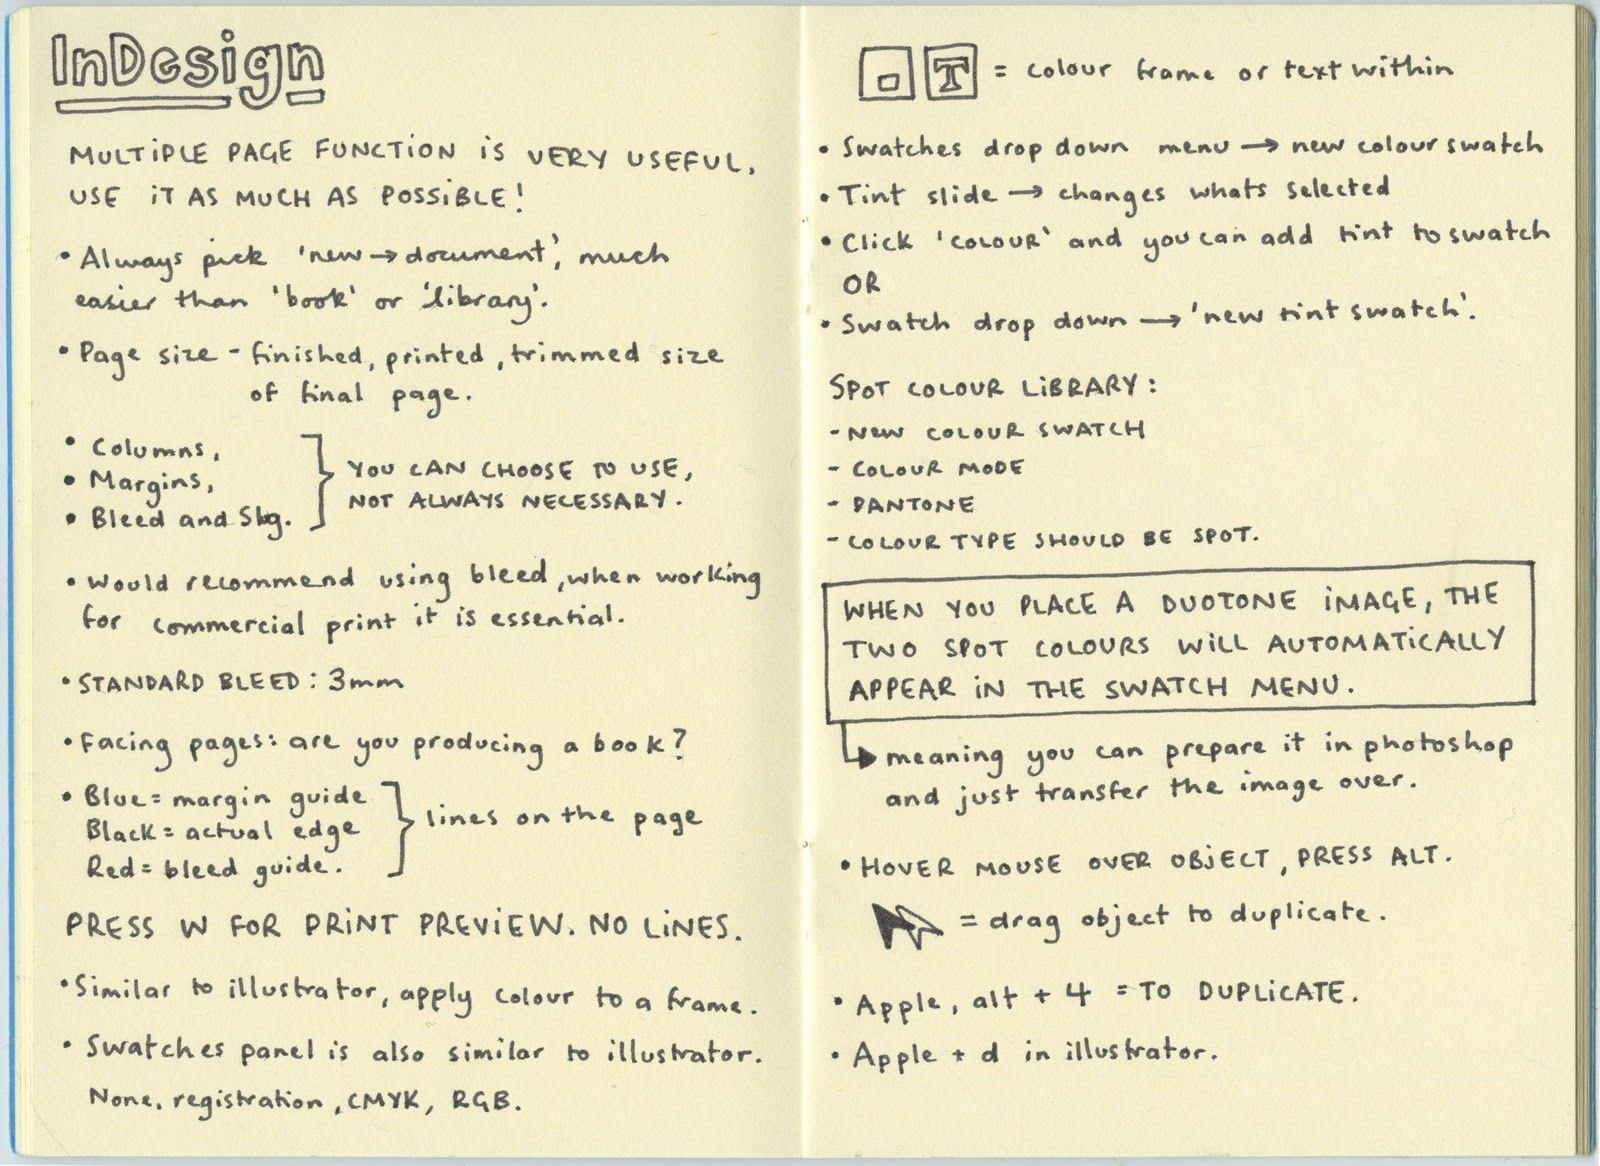 indesign cookbook template kids - Google Search   COOKBOOKS ...